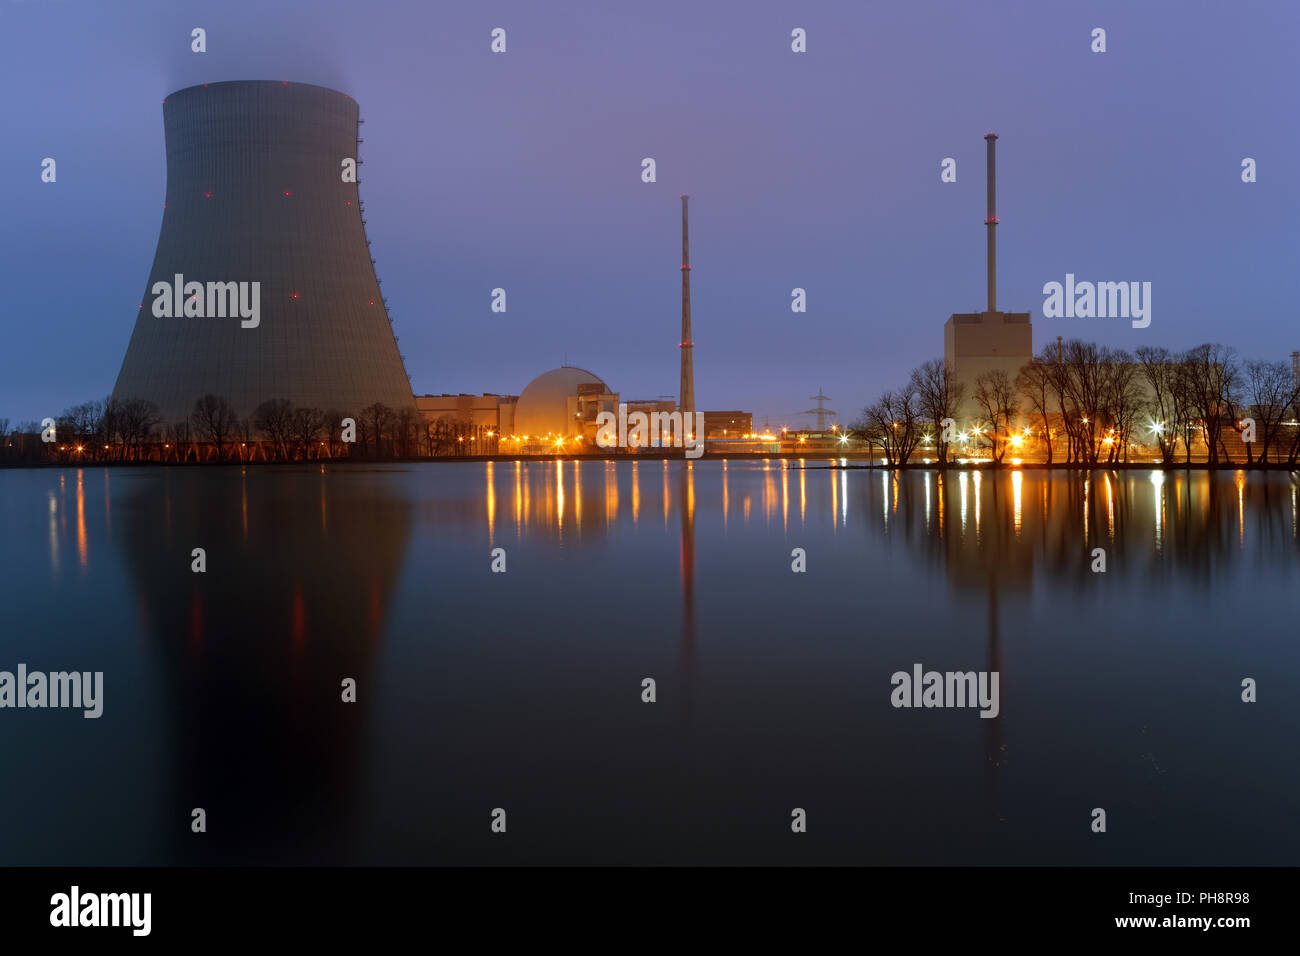 Kernkraftwerk Isar. - Stock Image